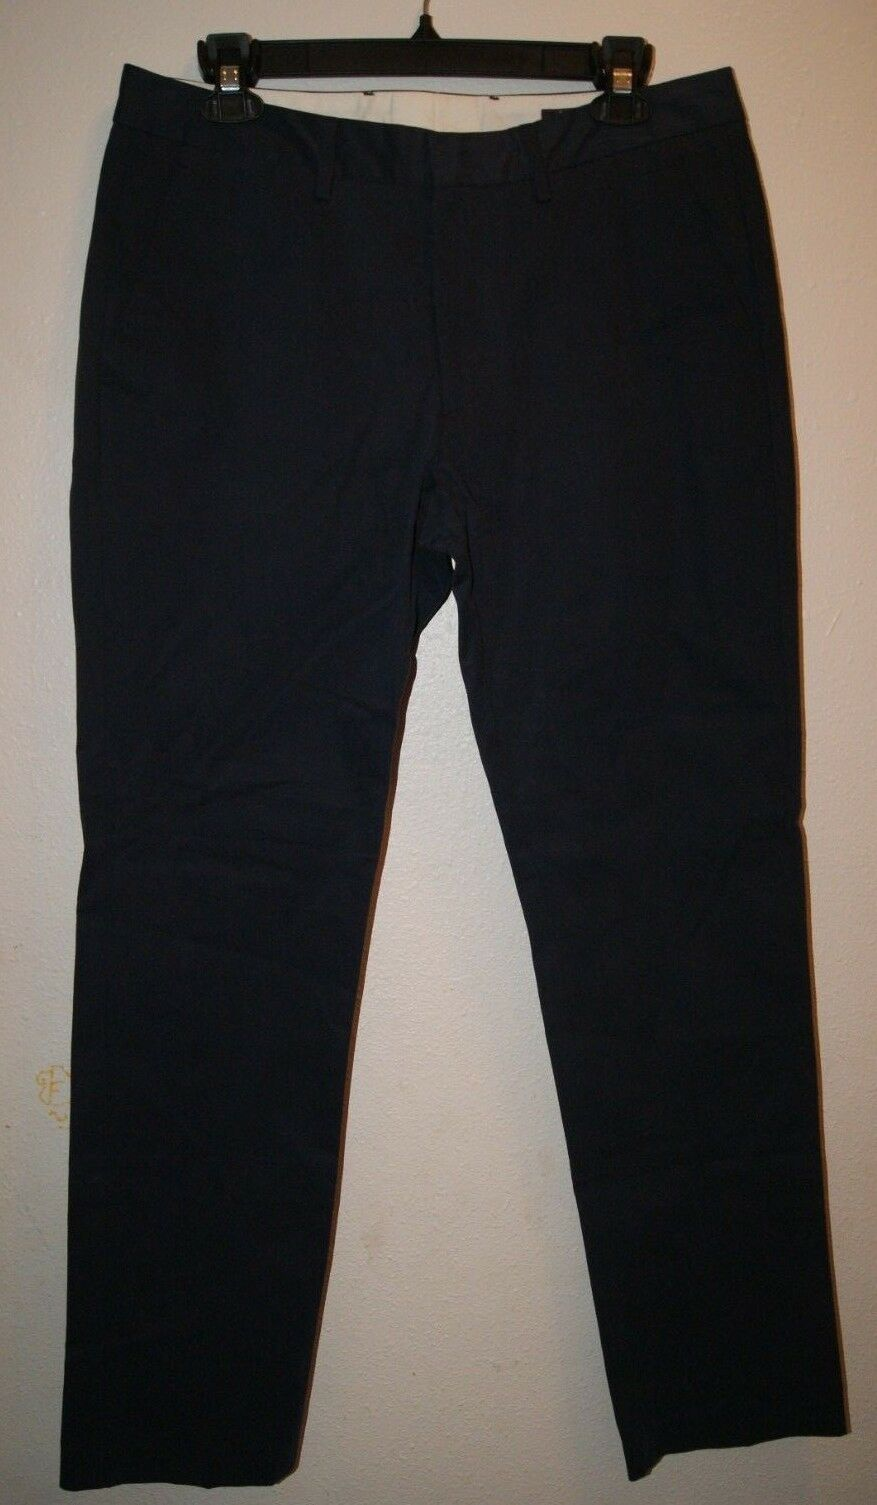 BONOBOS PREMIUM ITALIAN FABRIC PANTS - Faded Navy - SLIM Straight - 32 32 - NEW